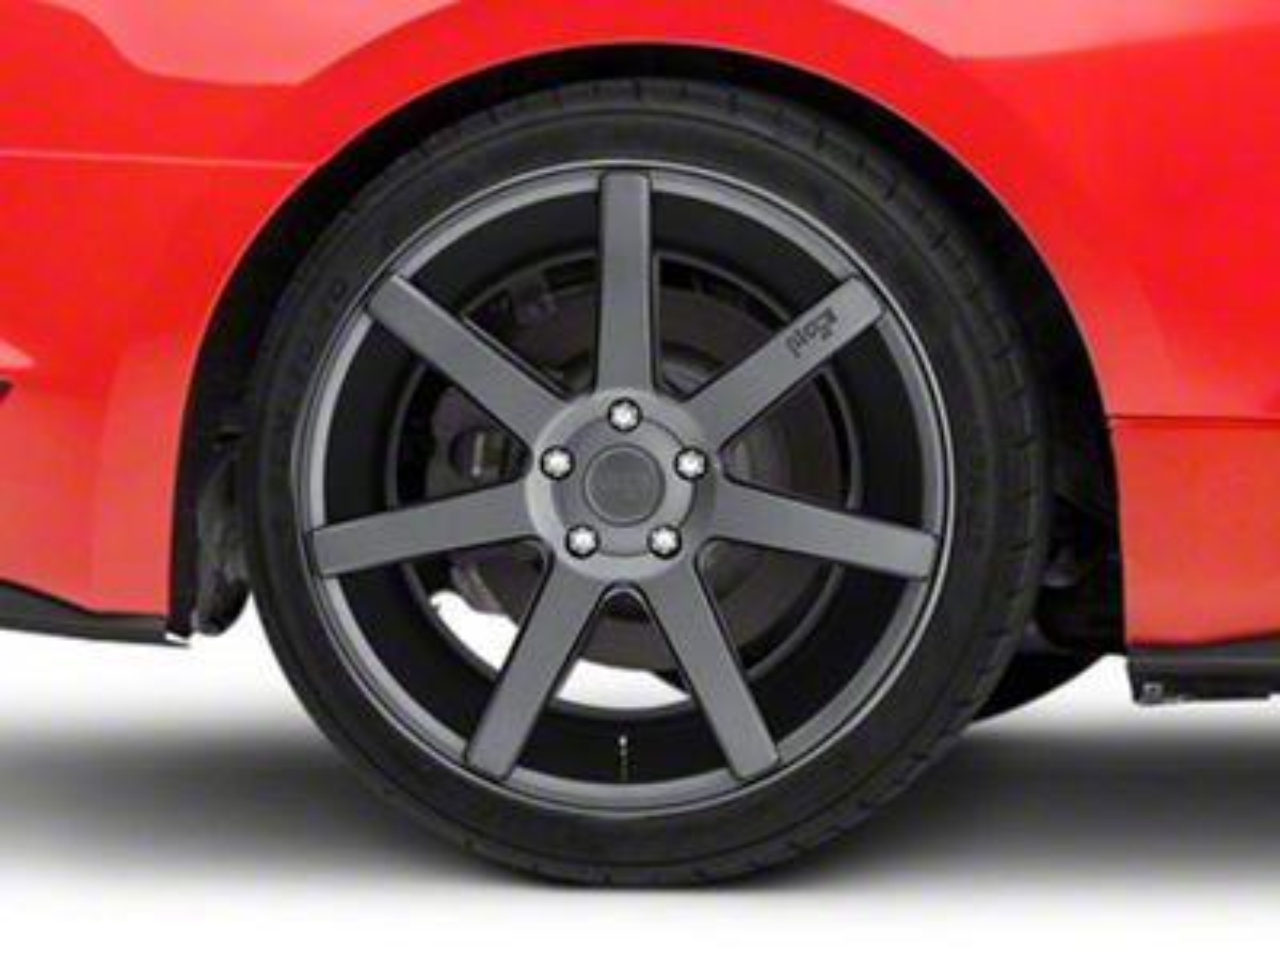 Niche Verona Anthracite Wheel - 20x10 - Rear Only (15-19 GT, EcoBoost, V6)